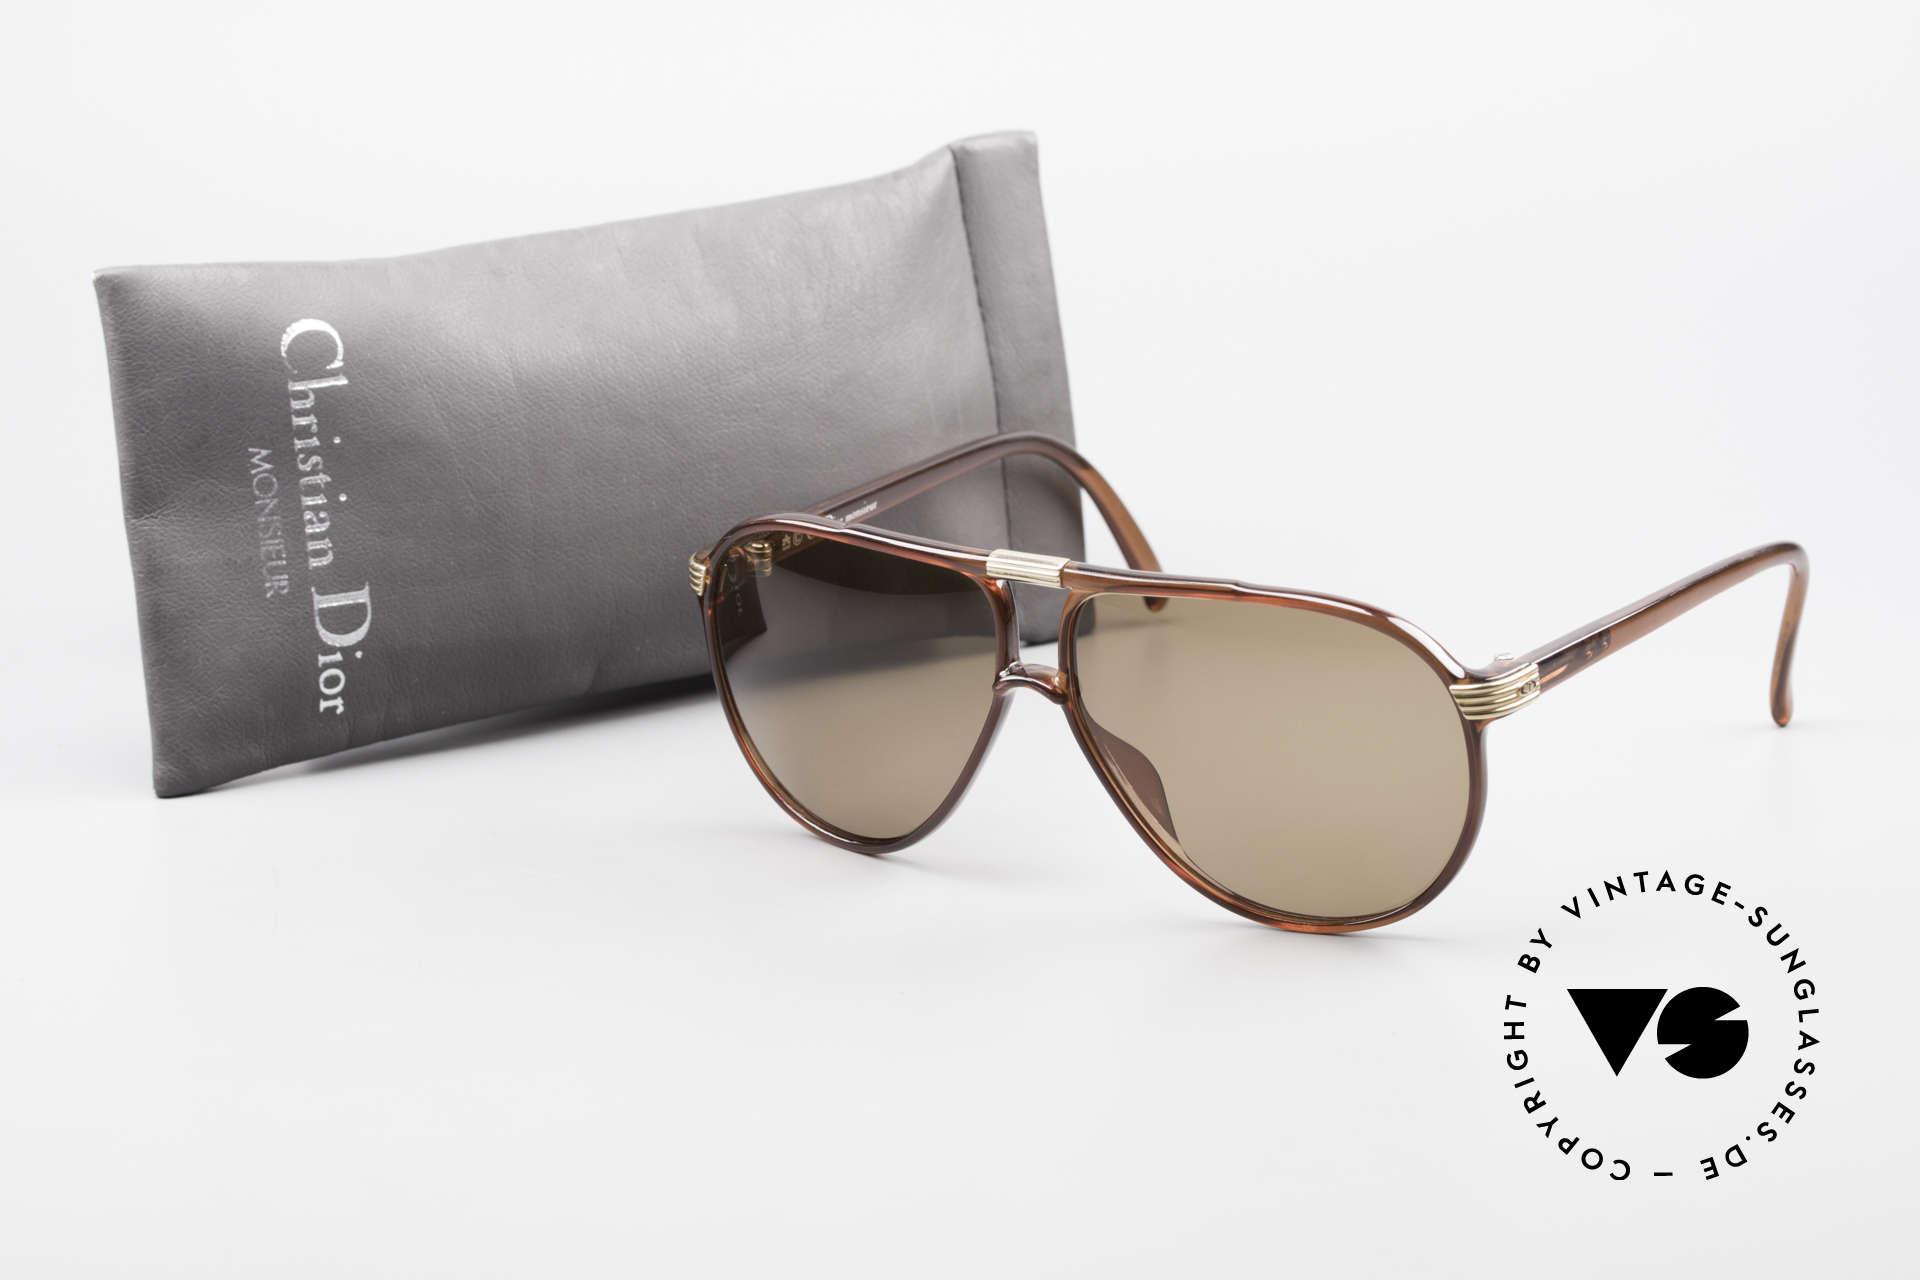 Christian Dior 2300 80's Aviator Sunglasses Optyl, Size: medium, Made for Men